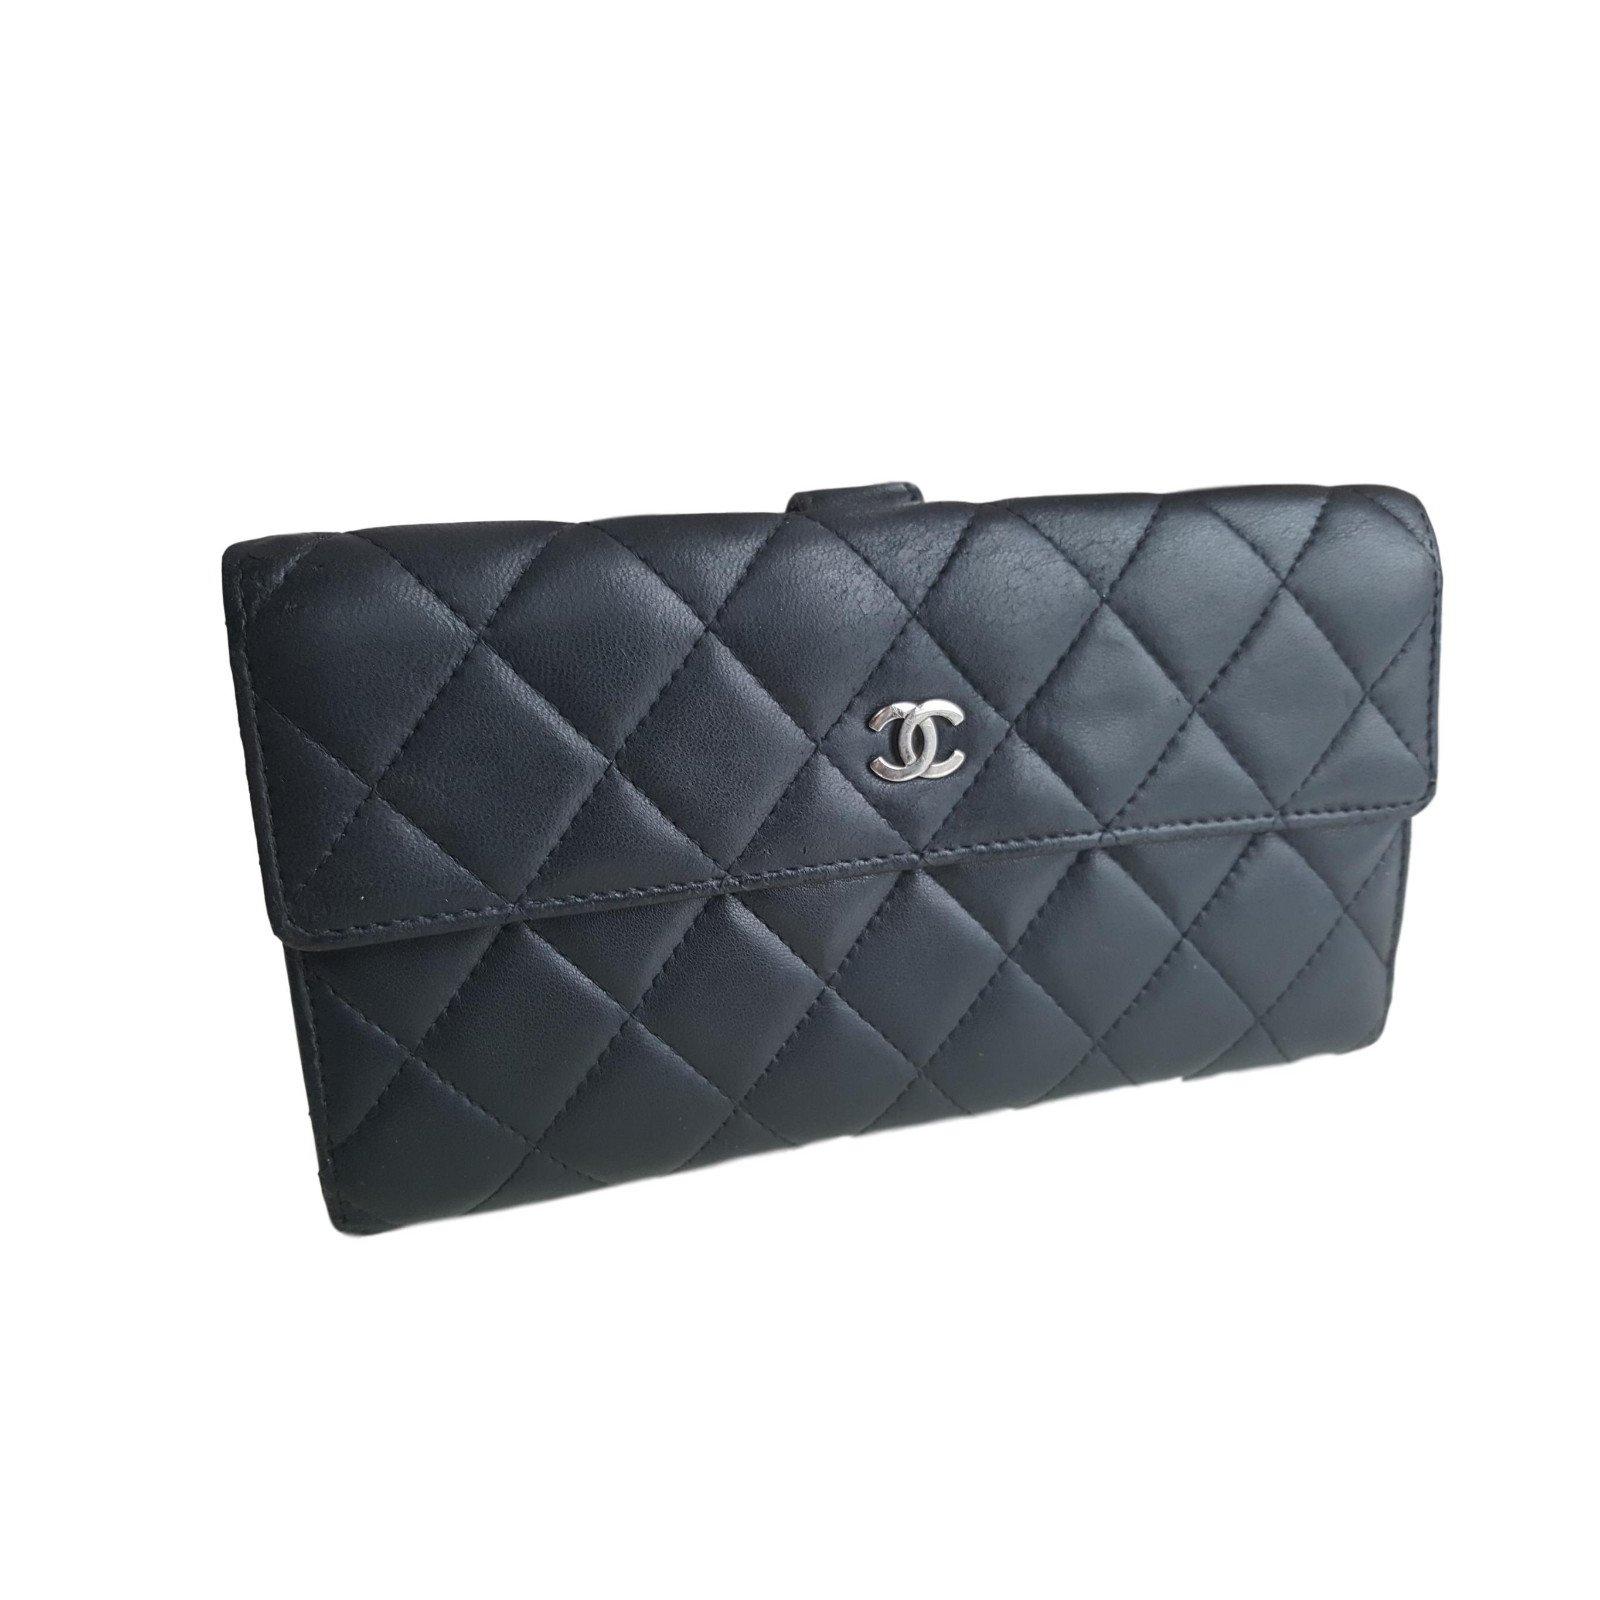 ef746e2cab5f Portefeuilles Chanel Portefeuilles Cuir Noir ref.60770 - Joli Closet